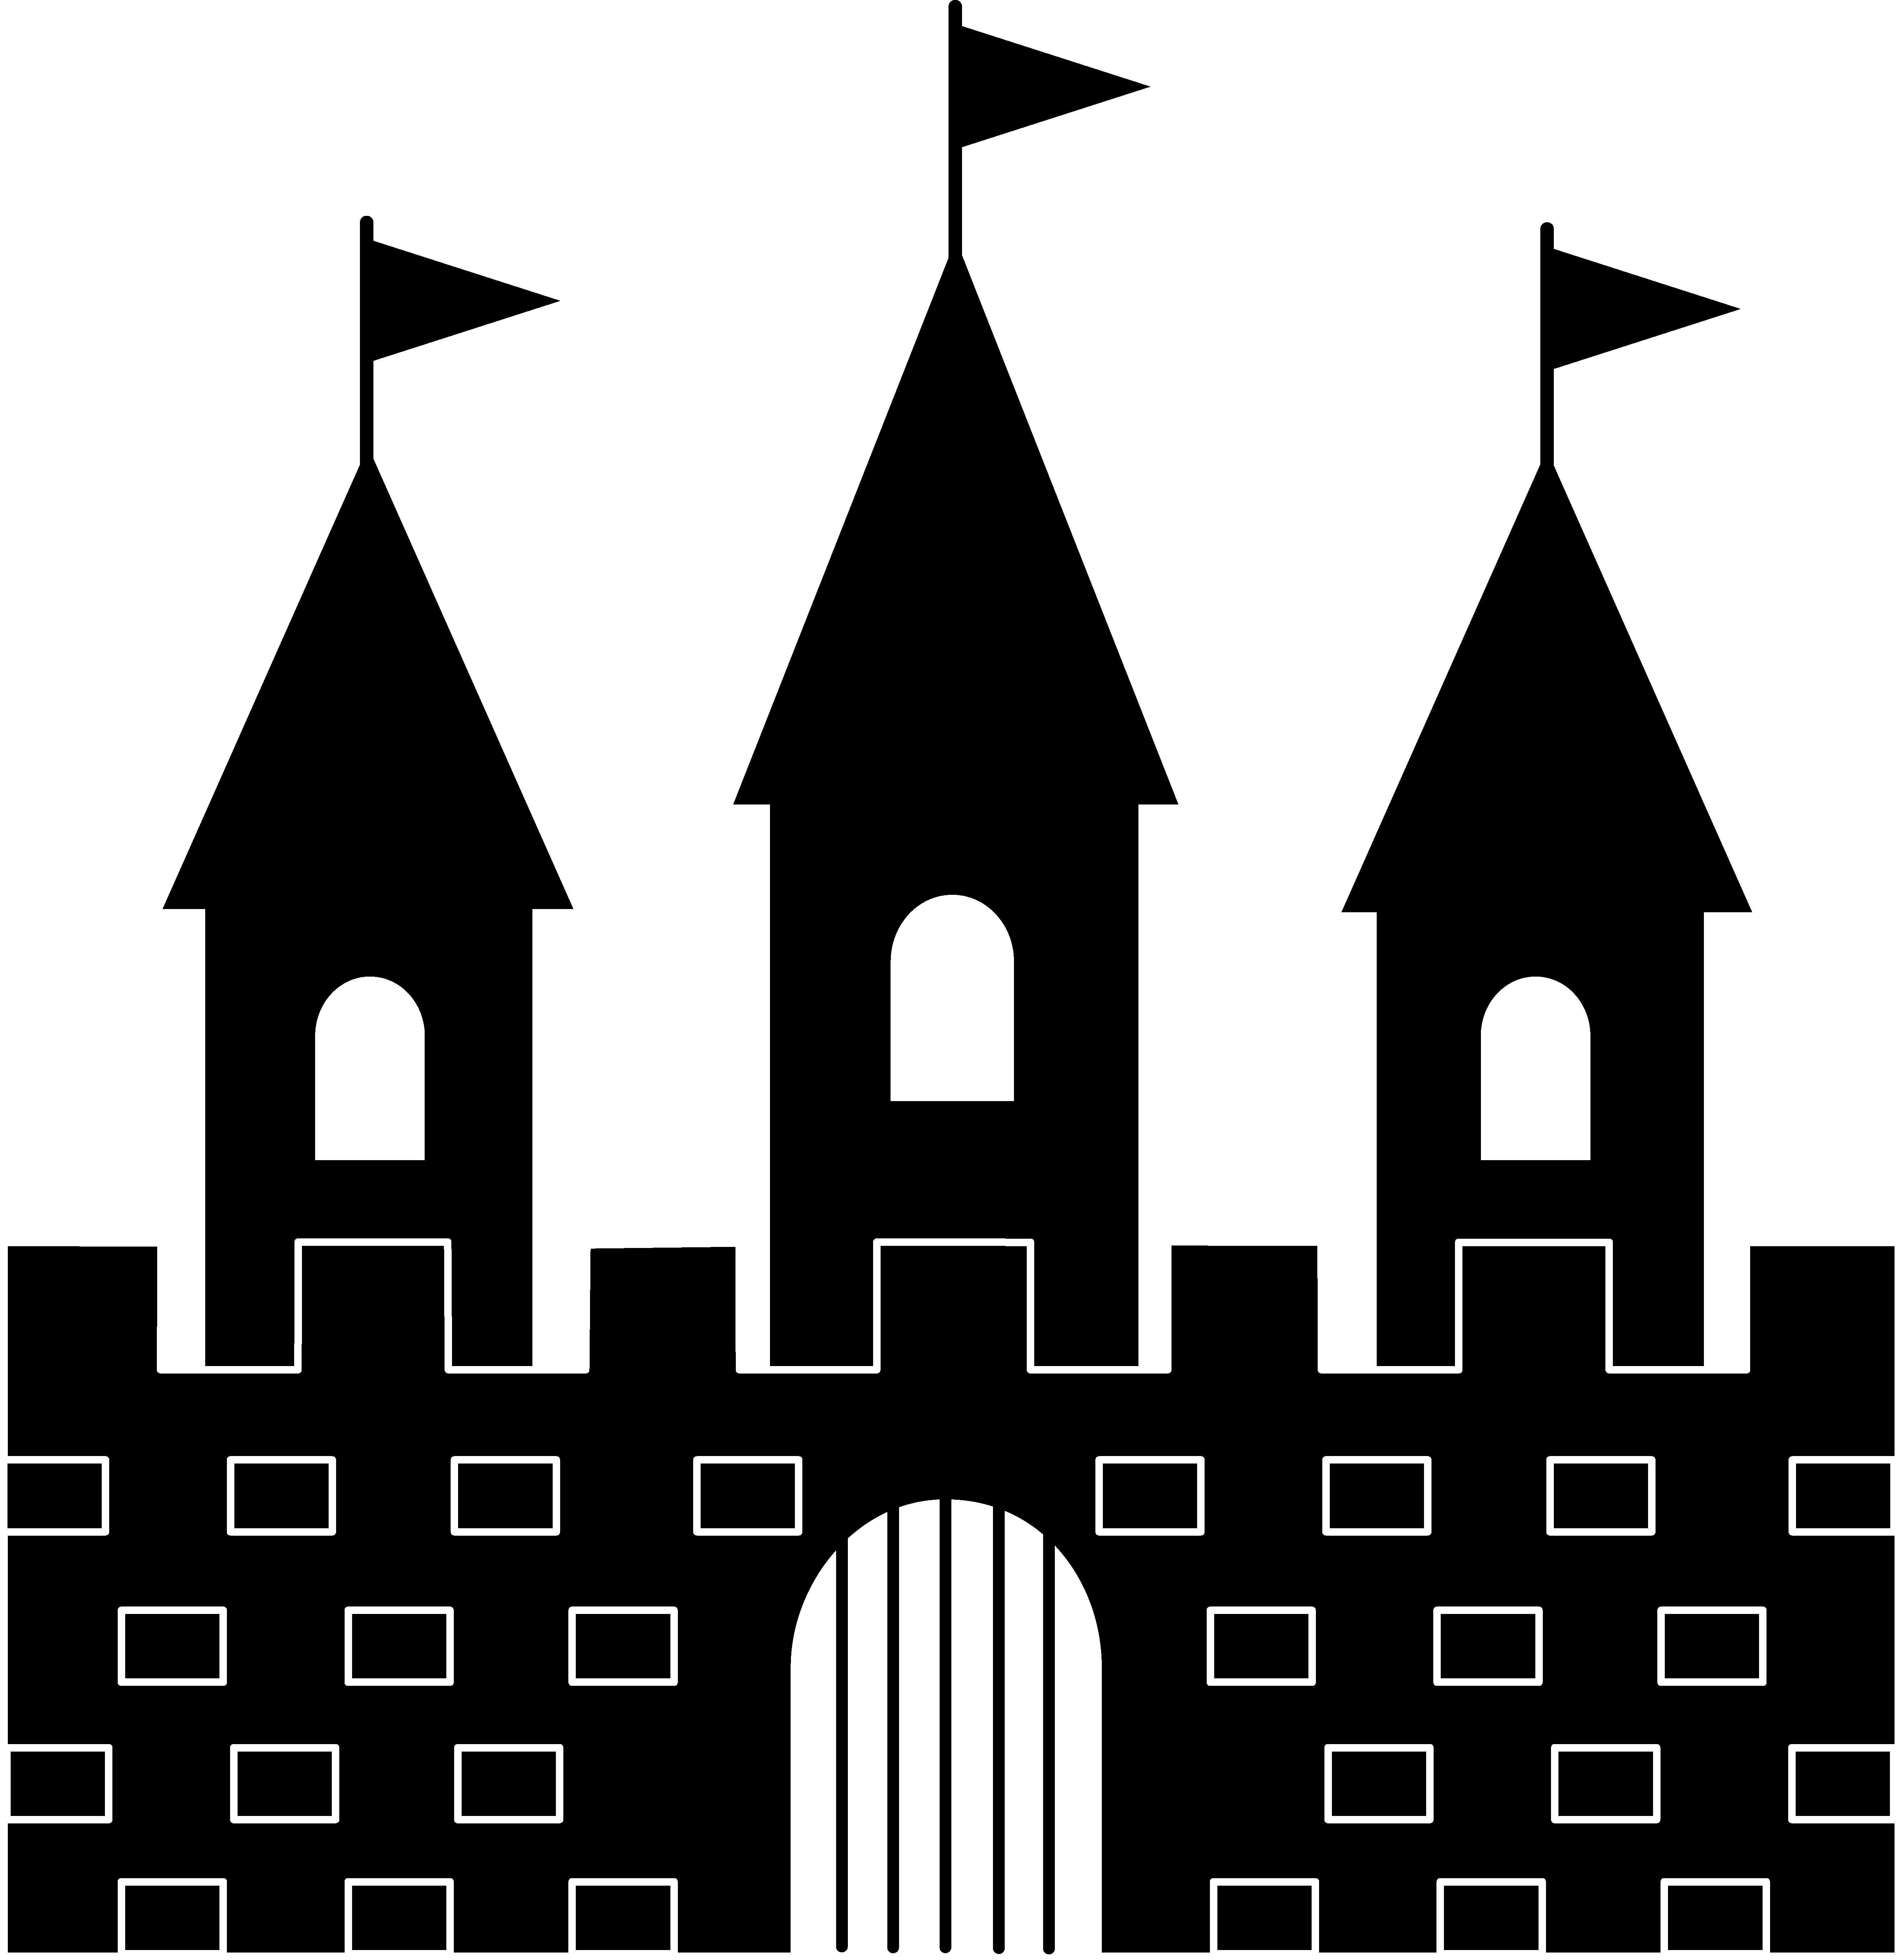 Clip art . Clipart castle balcony